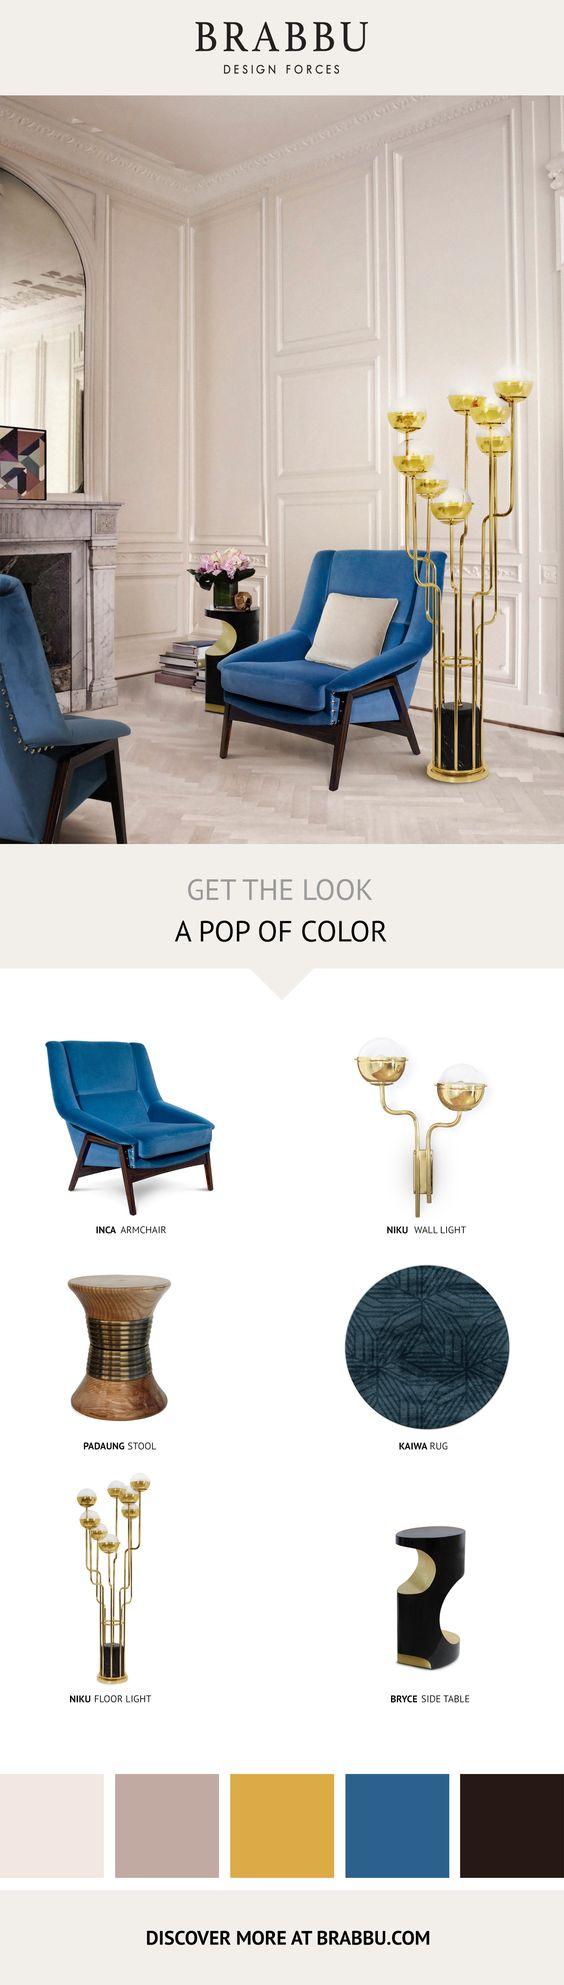 5 Outstanding Interior Design Tips To Always Have in Mind  5 Outstanding Interior Design Tips To Always Have in Mind! 5 Outstanding Interior Design Tips To Always Have in Mind! popofcolor